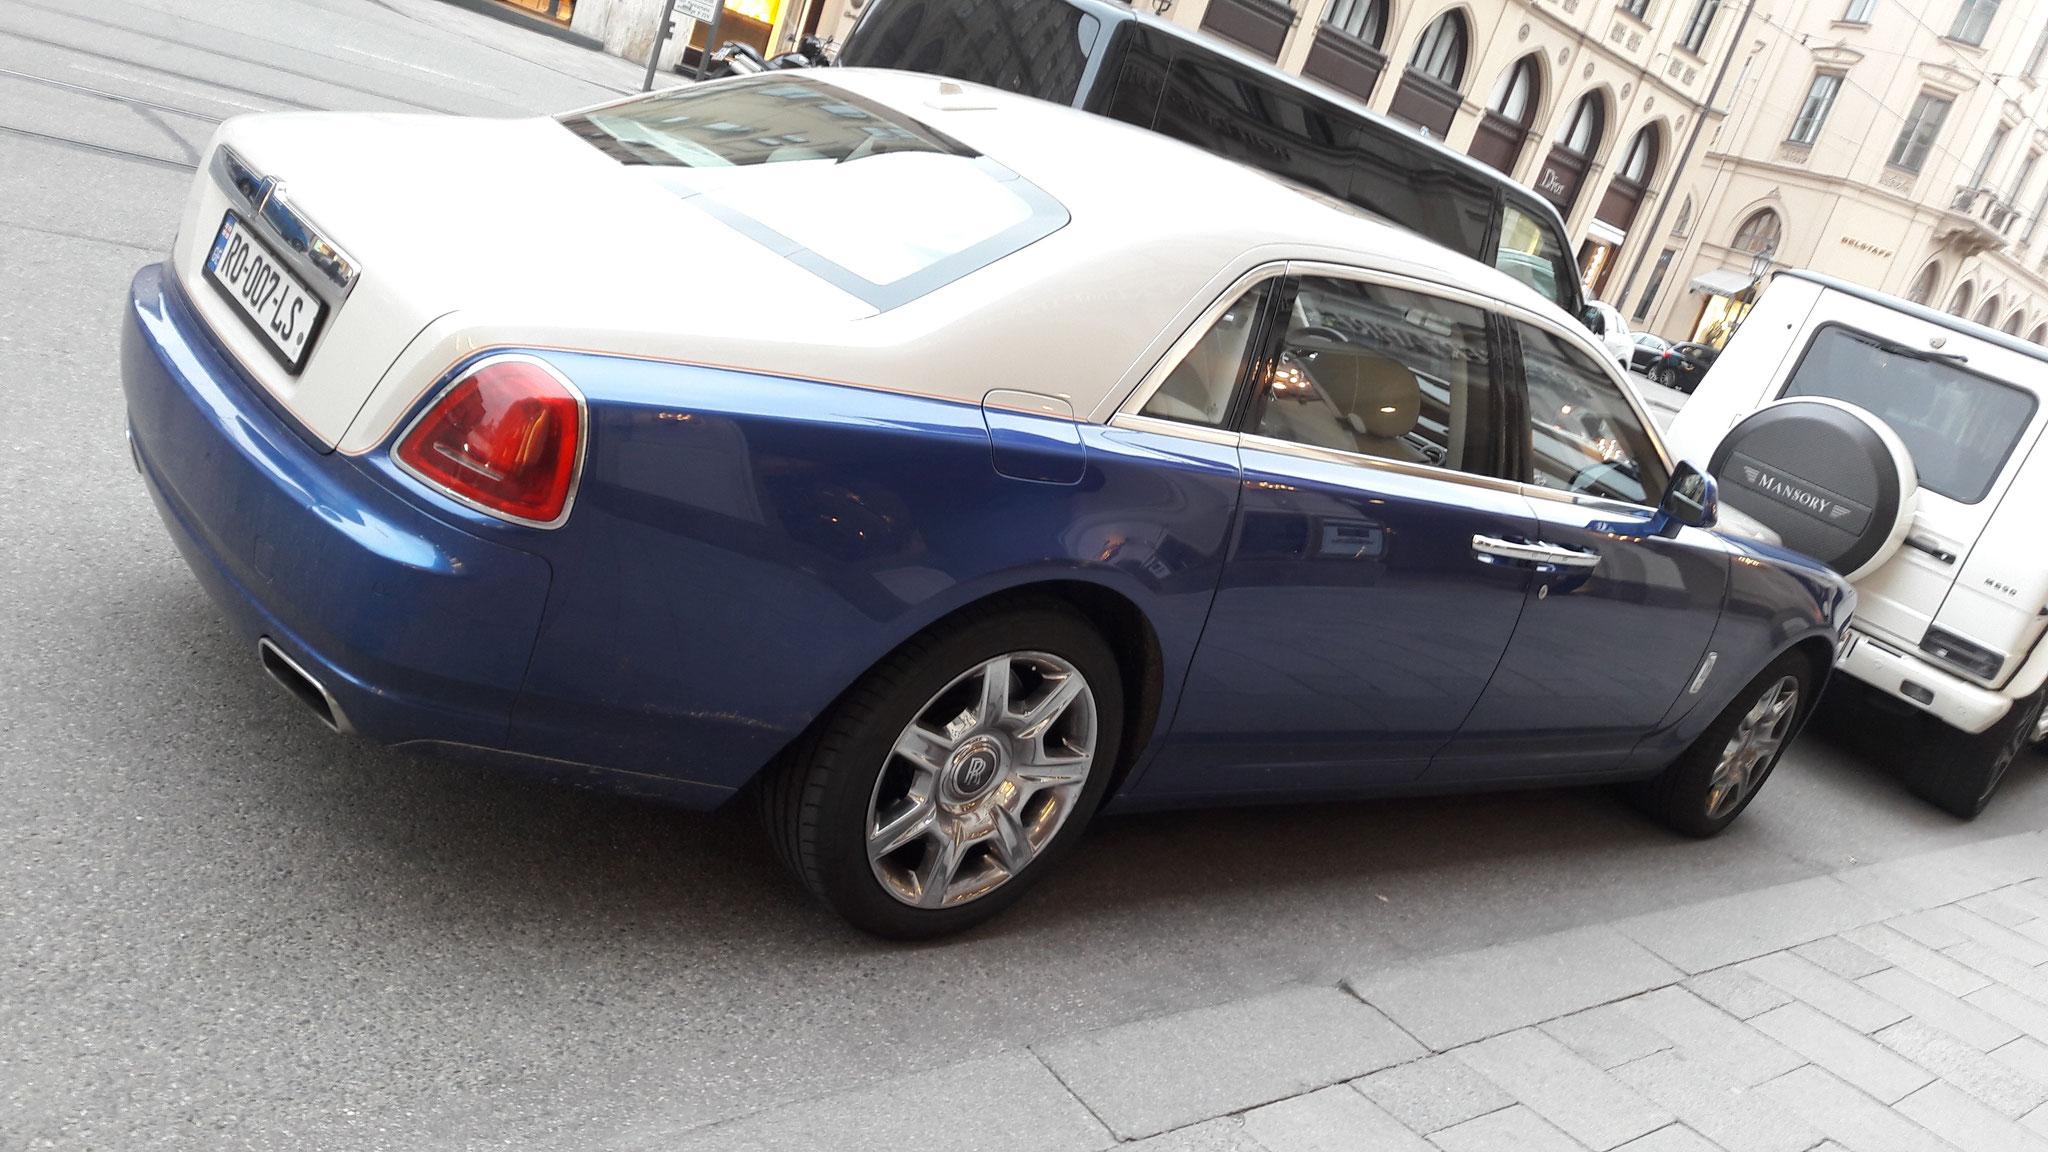 Rolls Royce Ghost - RO-007-LS